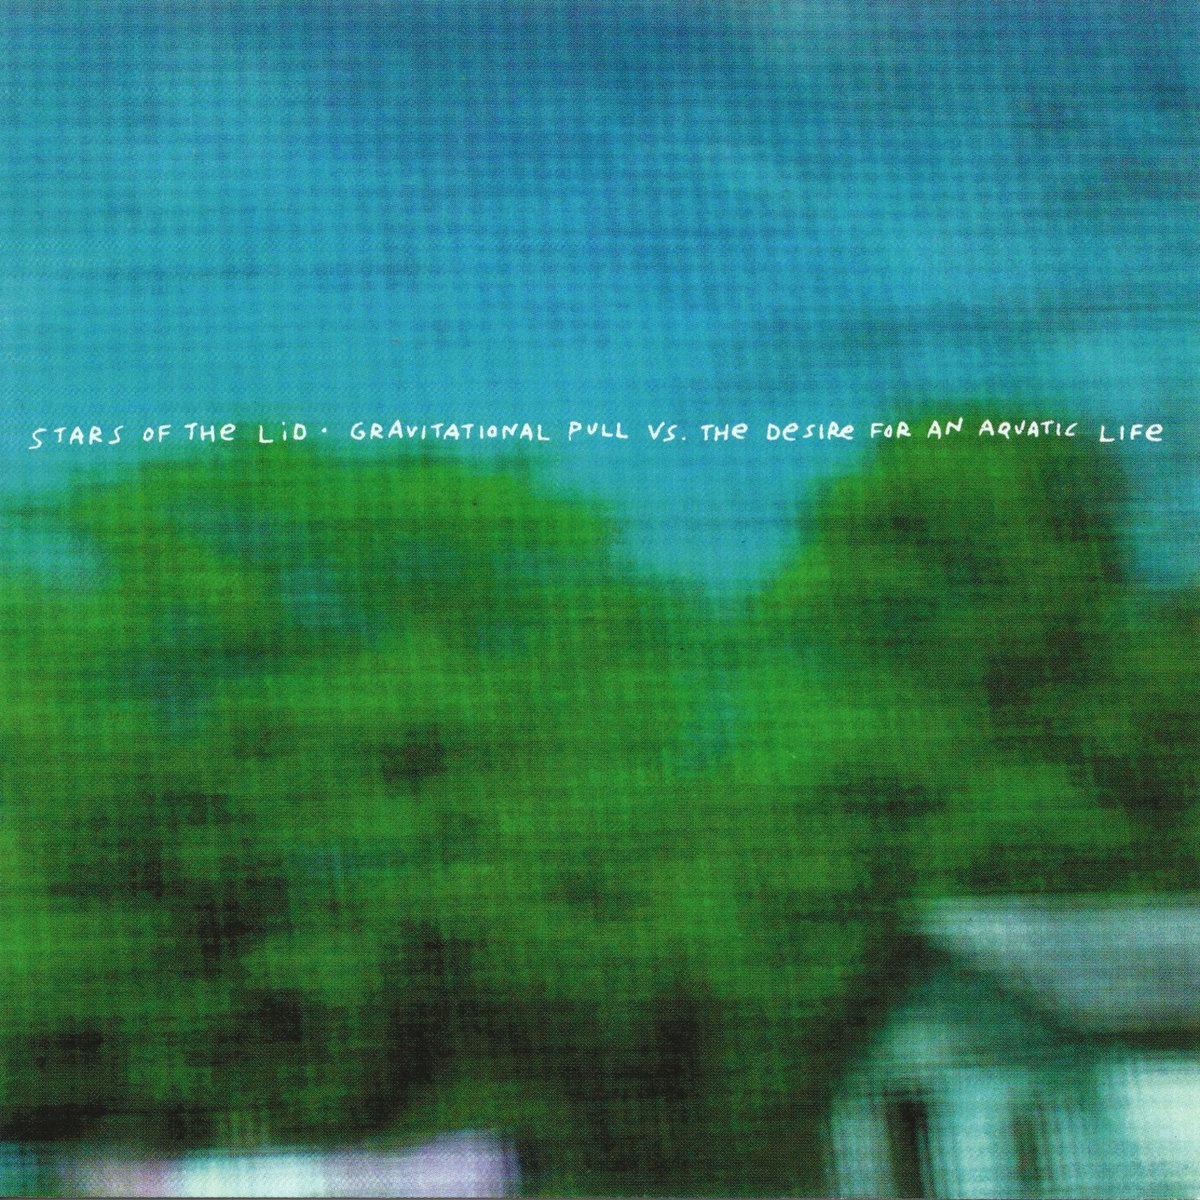 Stars Of The Lid reissue second album on vinyl